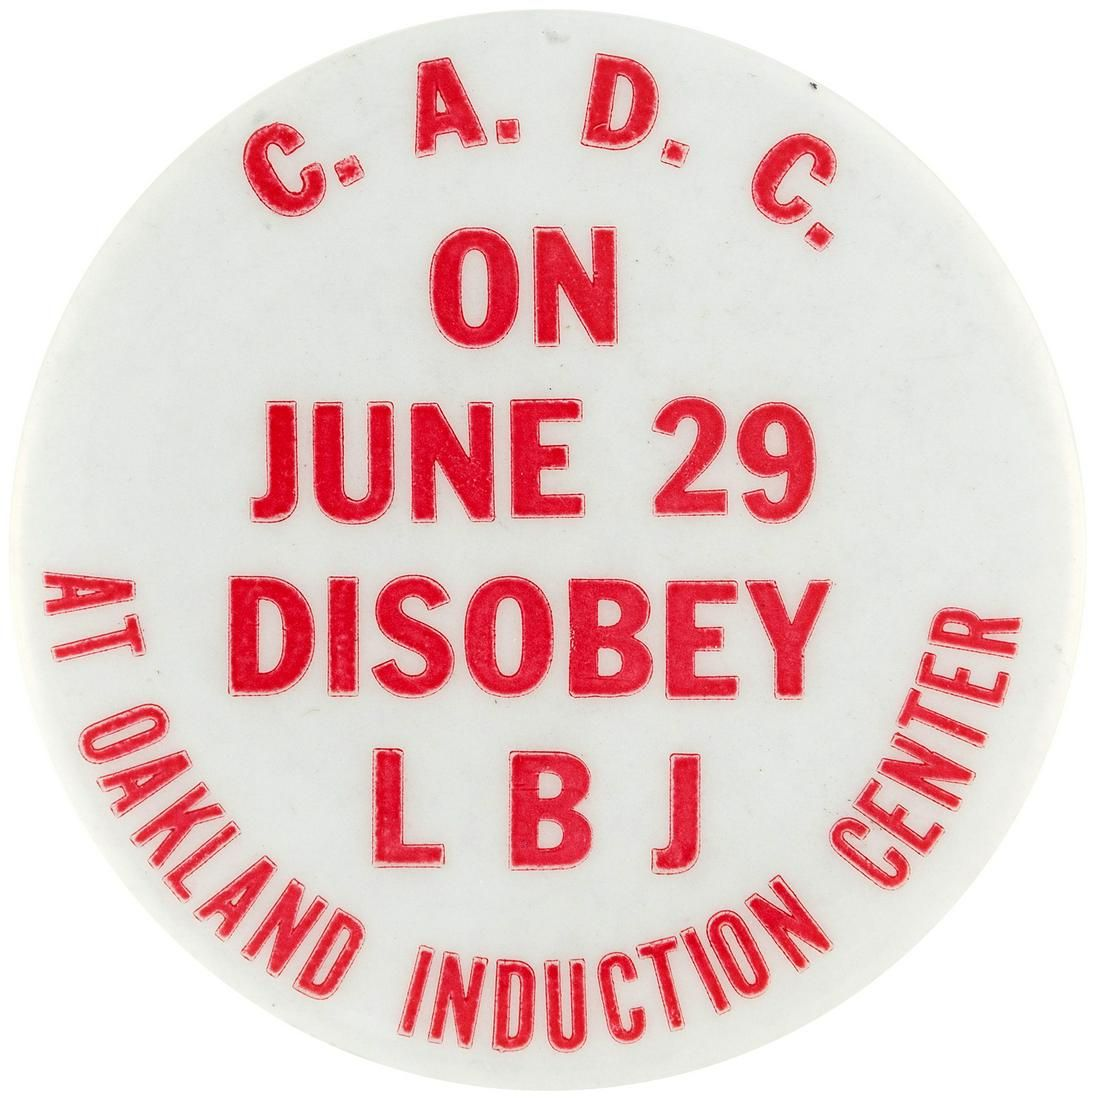 DISOBEY LBJ OAKLAND INDUCTION CENTER RARE ANTI-VIETNAM